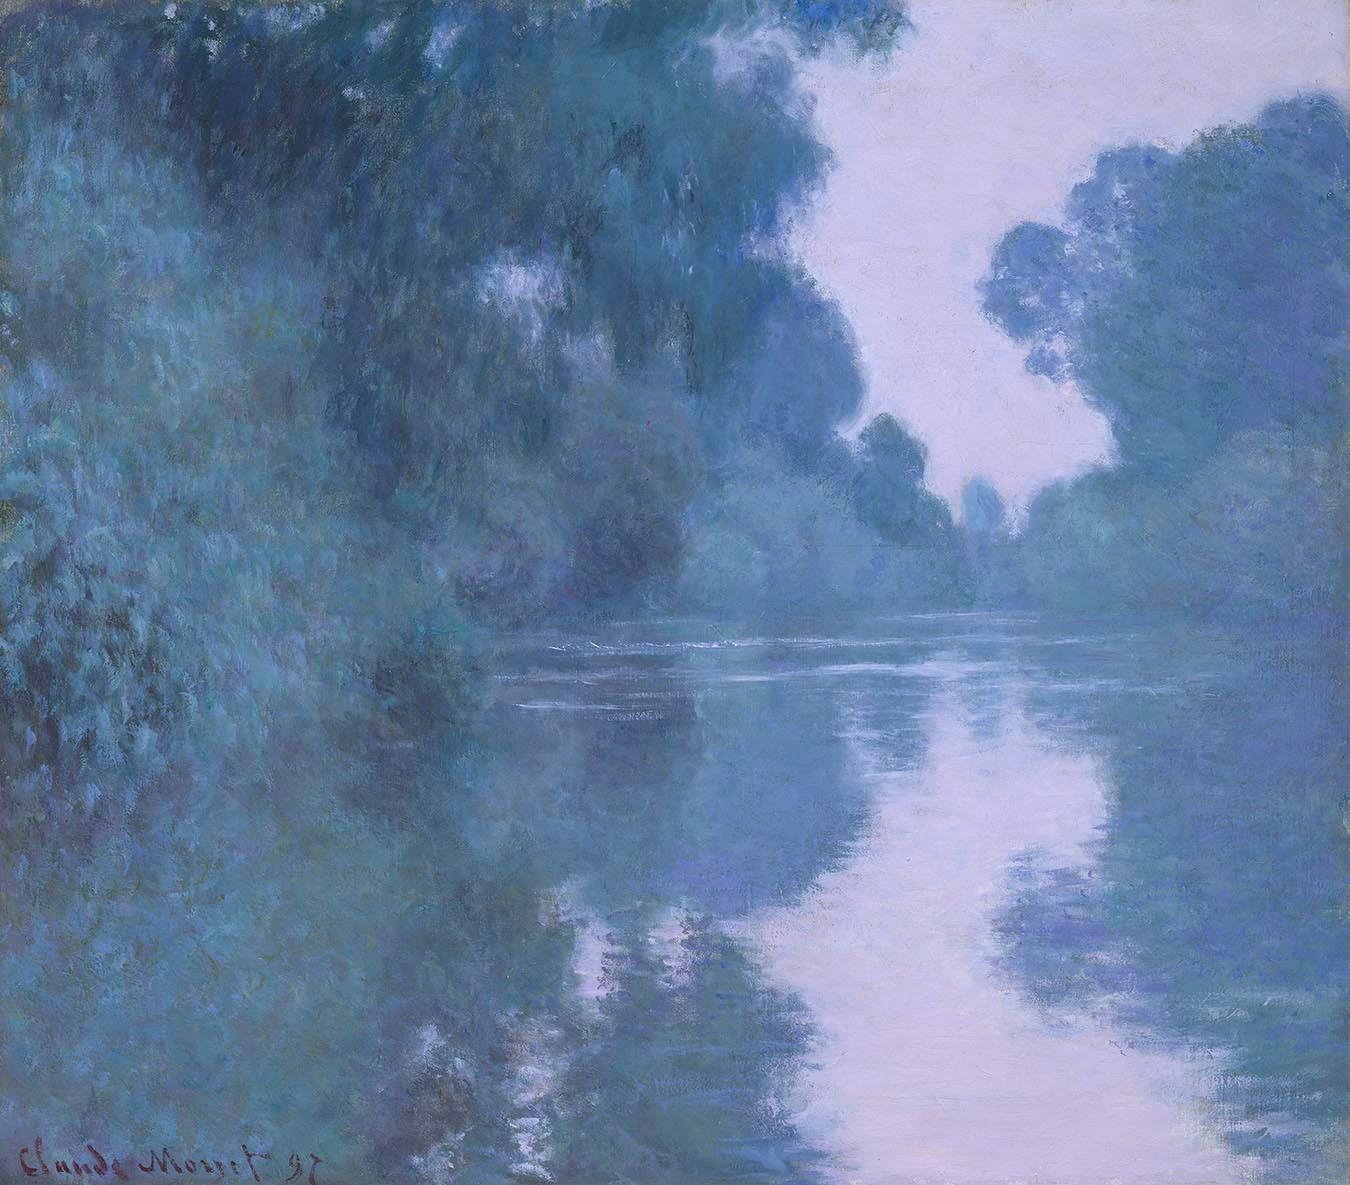 Essay topic about river seine?